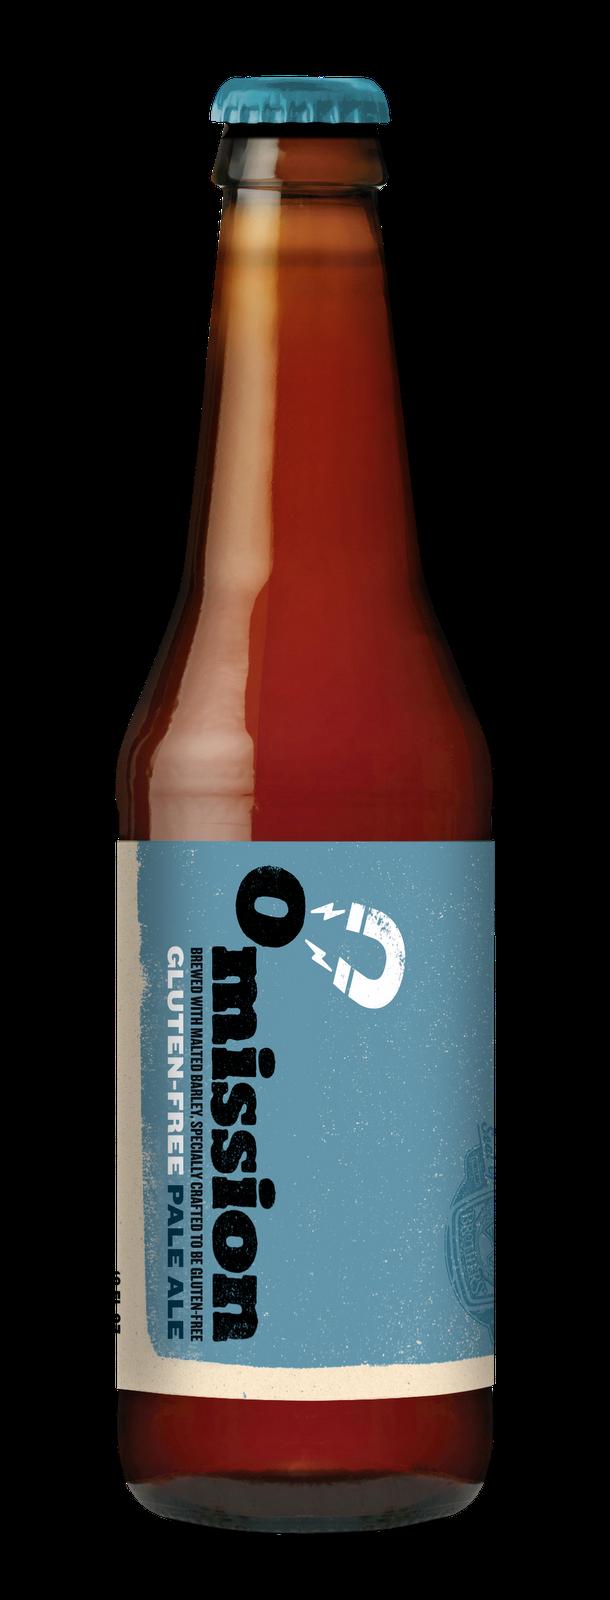 bottle Omission Beer Widmer gluten reduced removed free low pale ale bier celiac test result level Portland test result craft micro brew